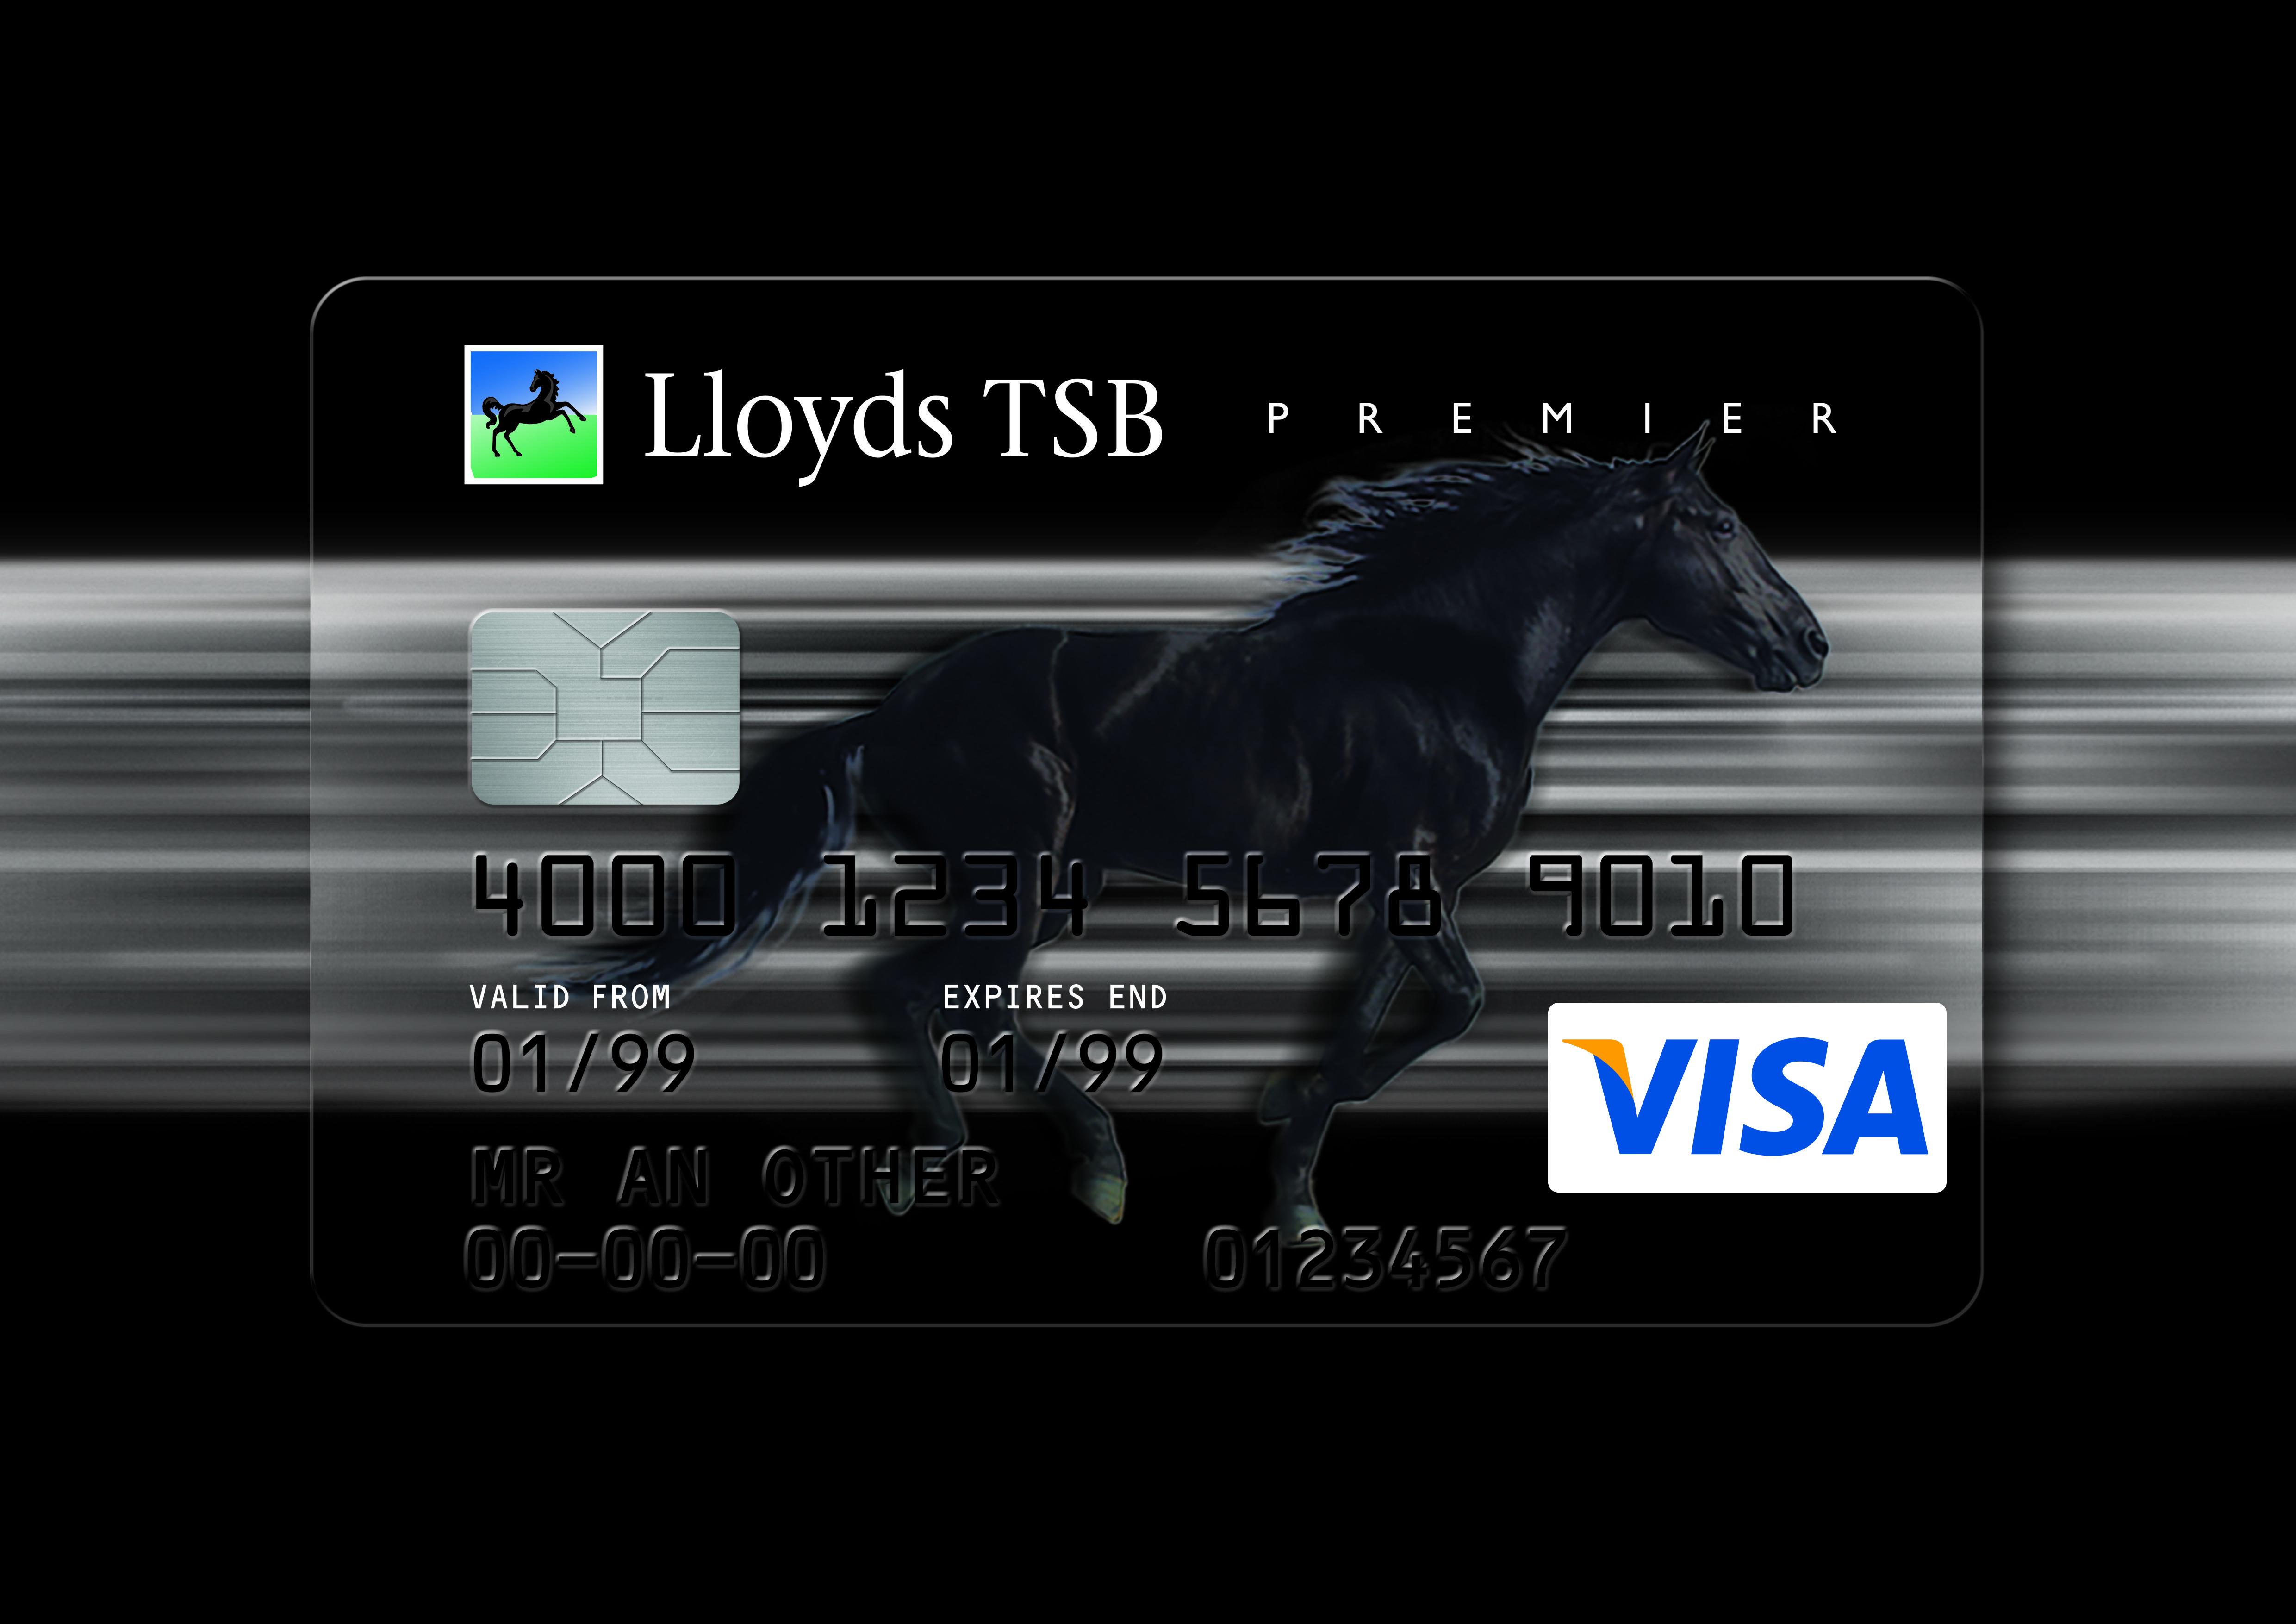 Lloyds Tsb Credit Card Redesign Branding Design Brand Colors Lloyd